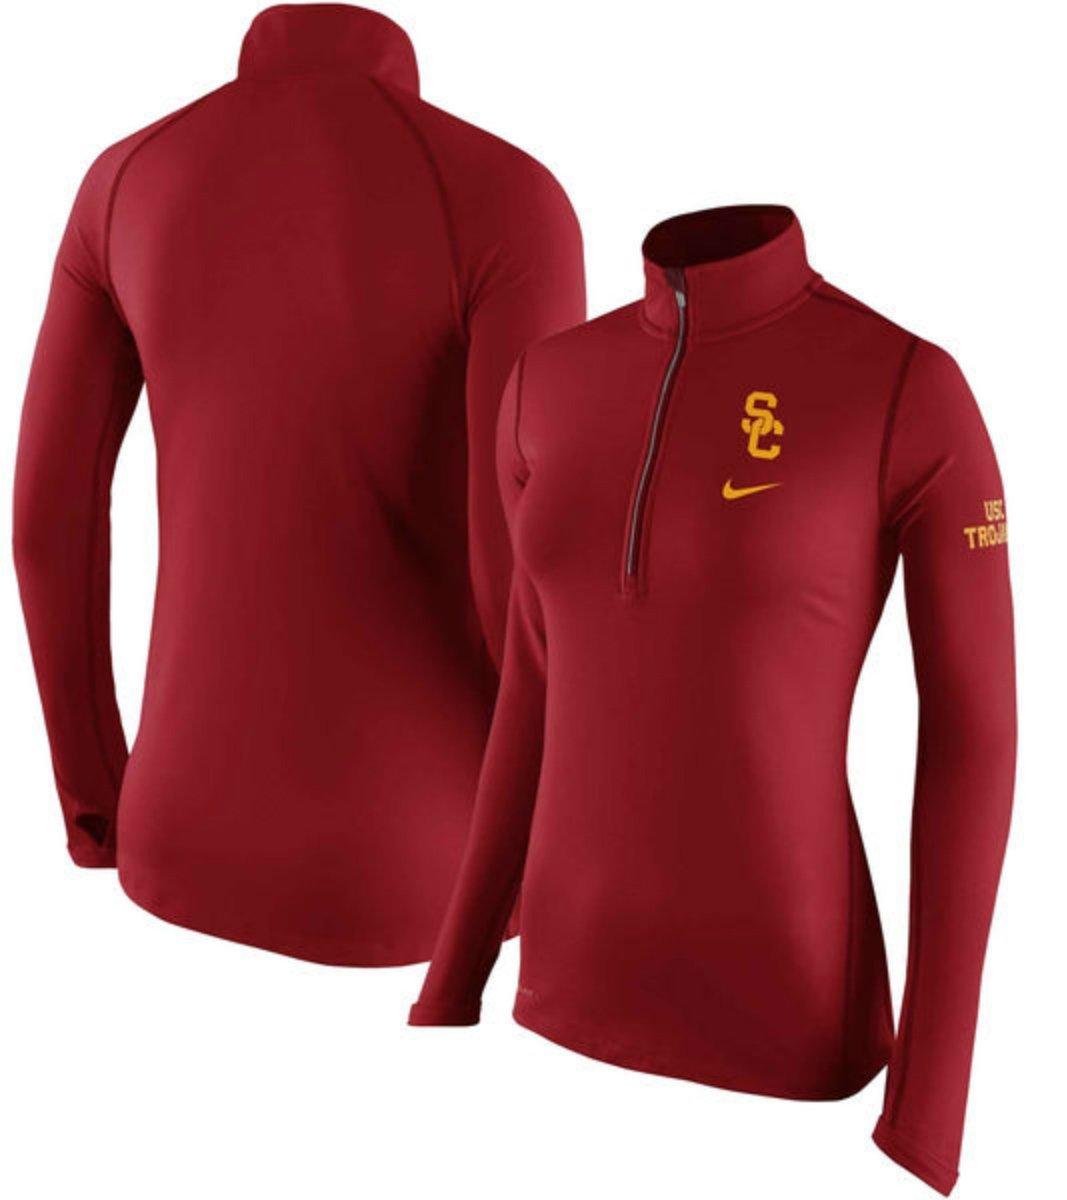 USC Trojans Nike NCAA Womens X-Large Tailgate Element Half Zip Shirt